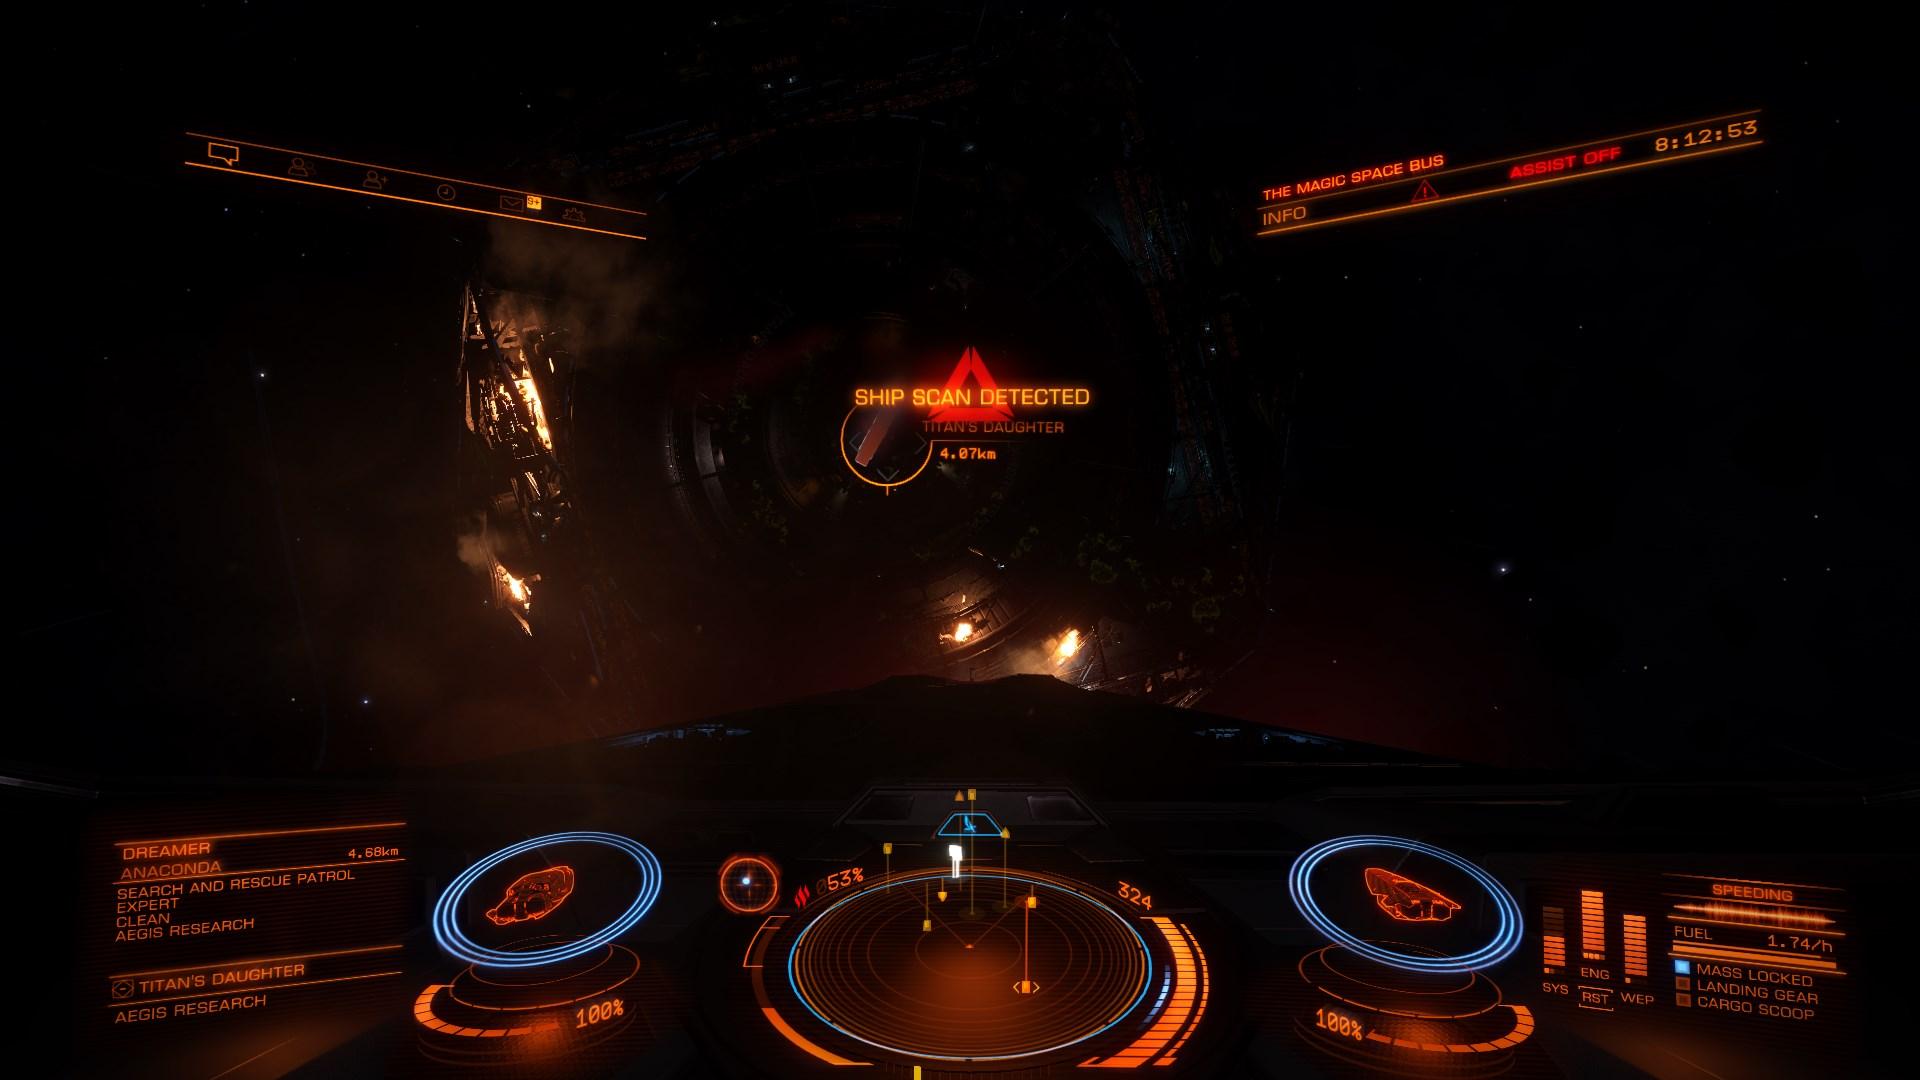 Alien Krieg Thargoiden Greifen Raumstationen In Elite Dangerous An